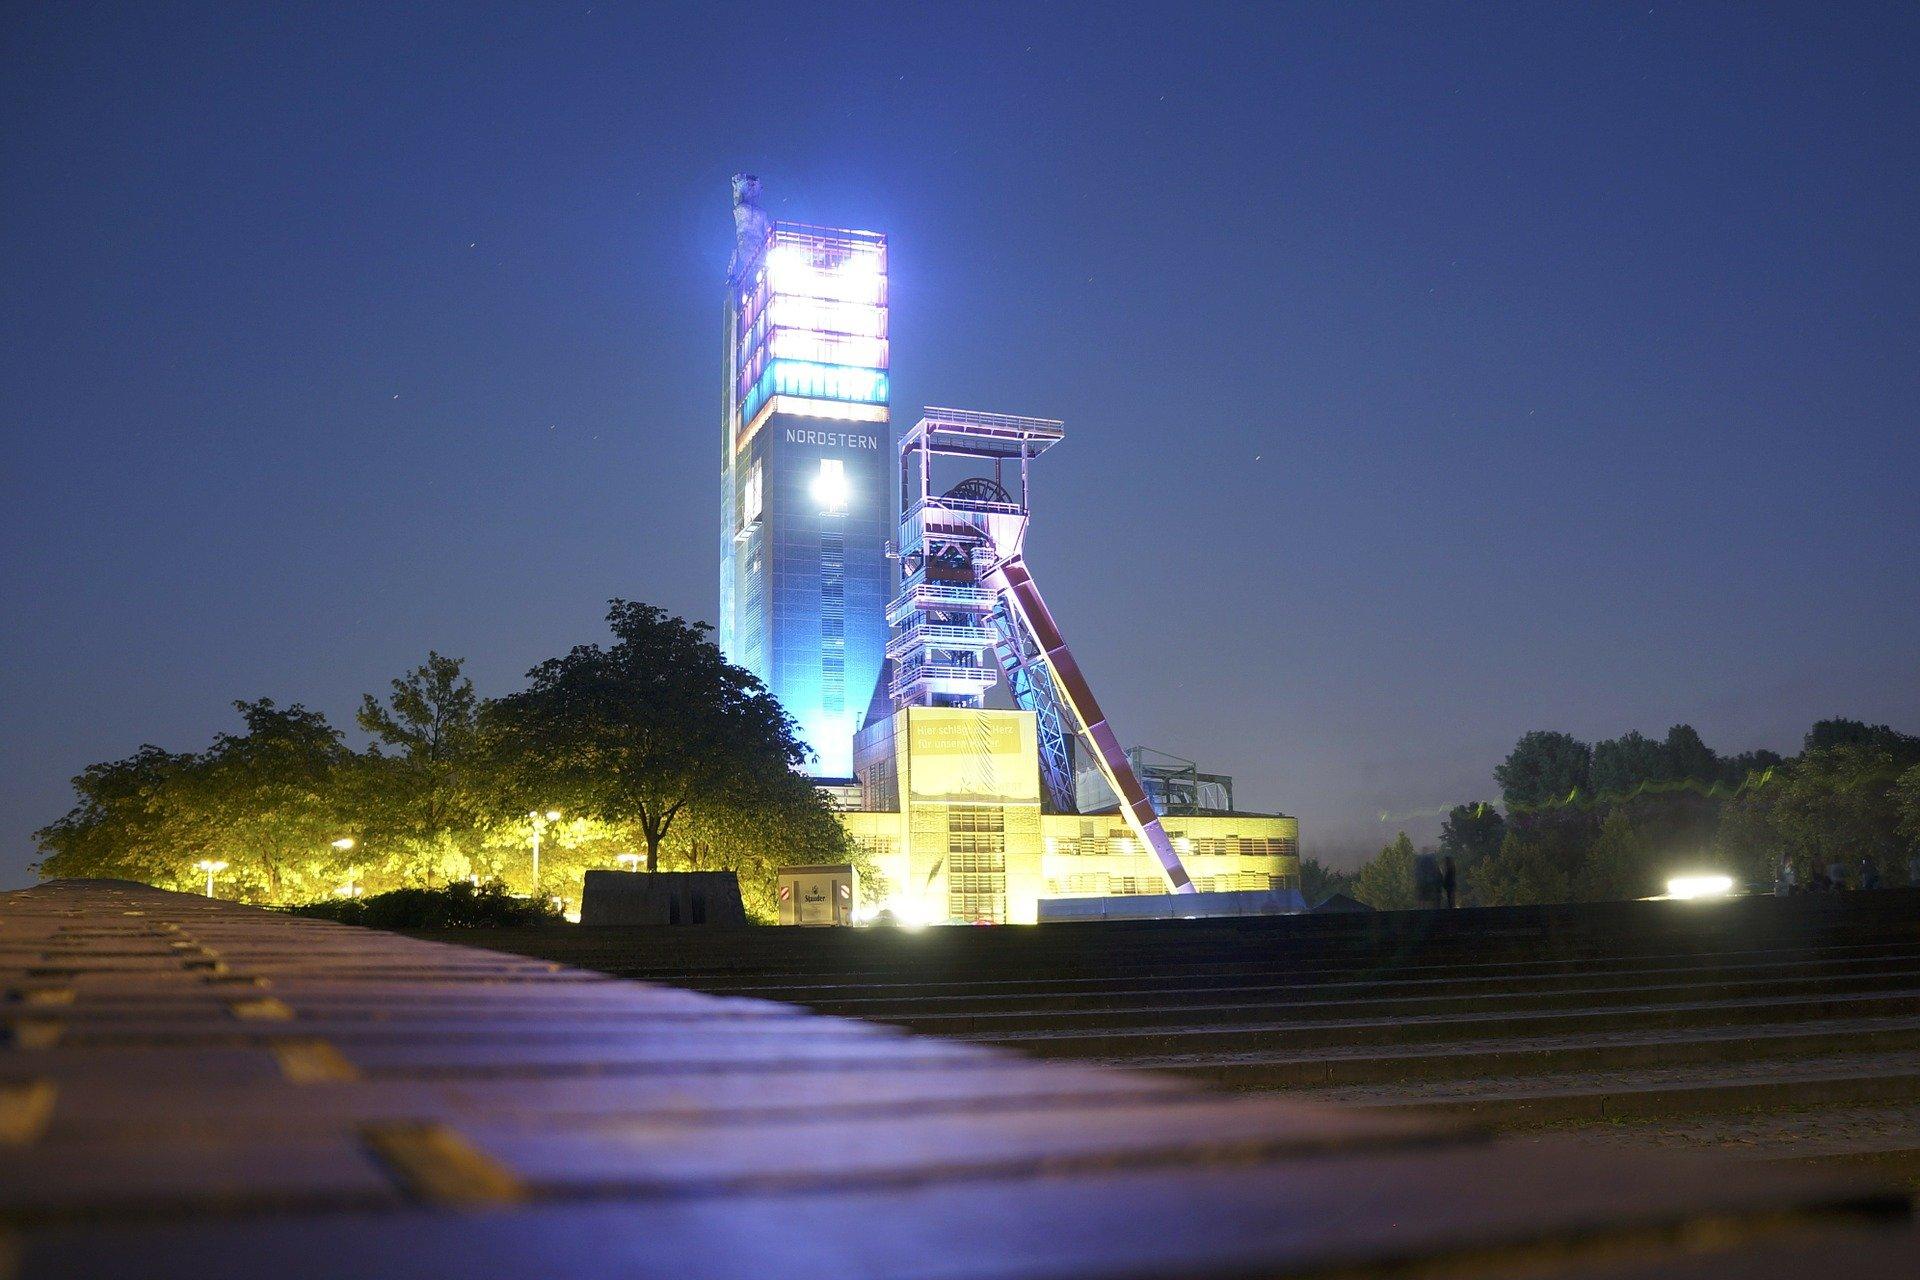 Bild der Zeche in Gelsenkirchen bei Nacht